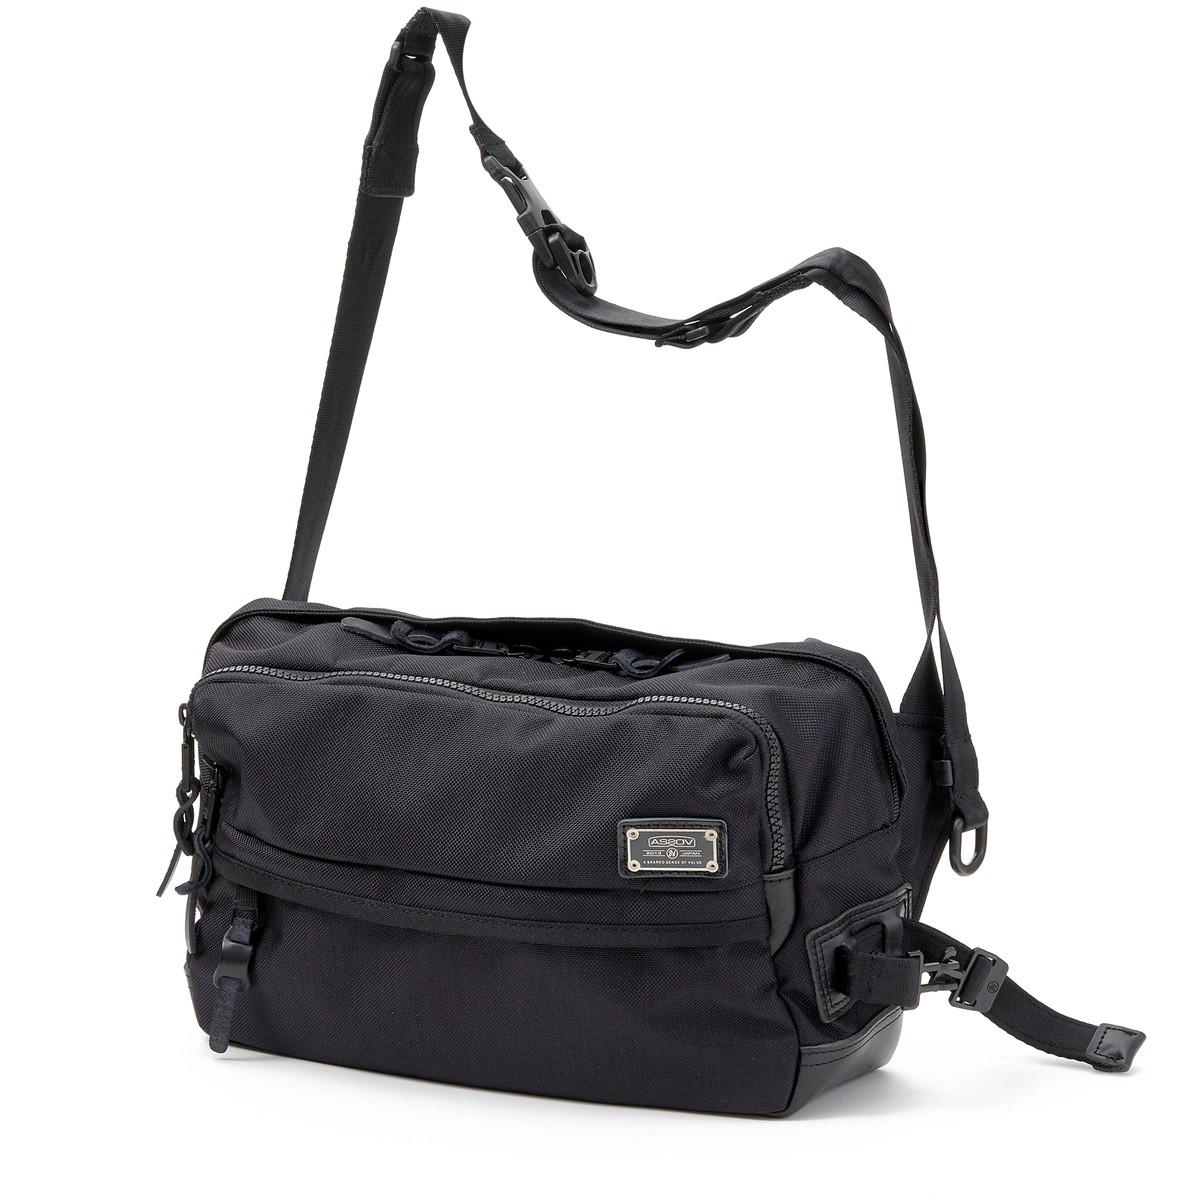 AS2OV (アッソブ) EXCLUSIVE BALLISTIC NYLON BODY BAG 061318